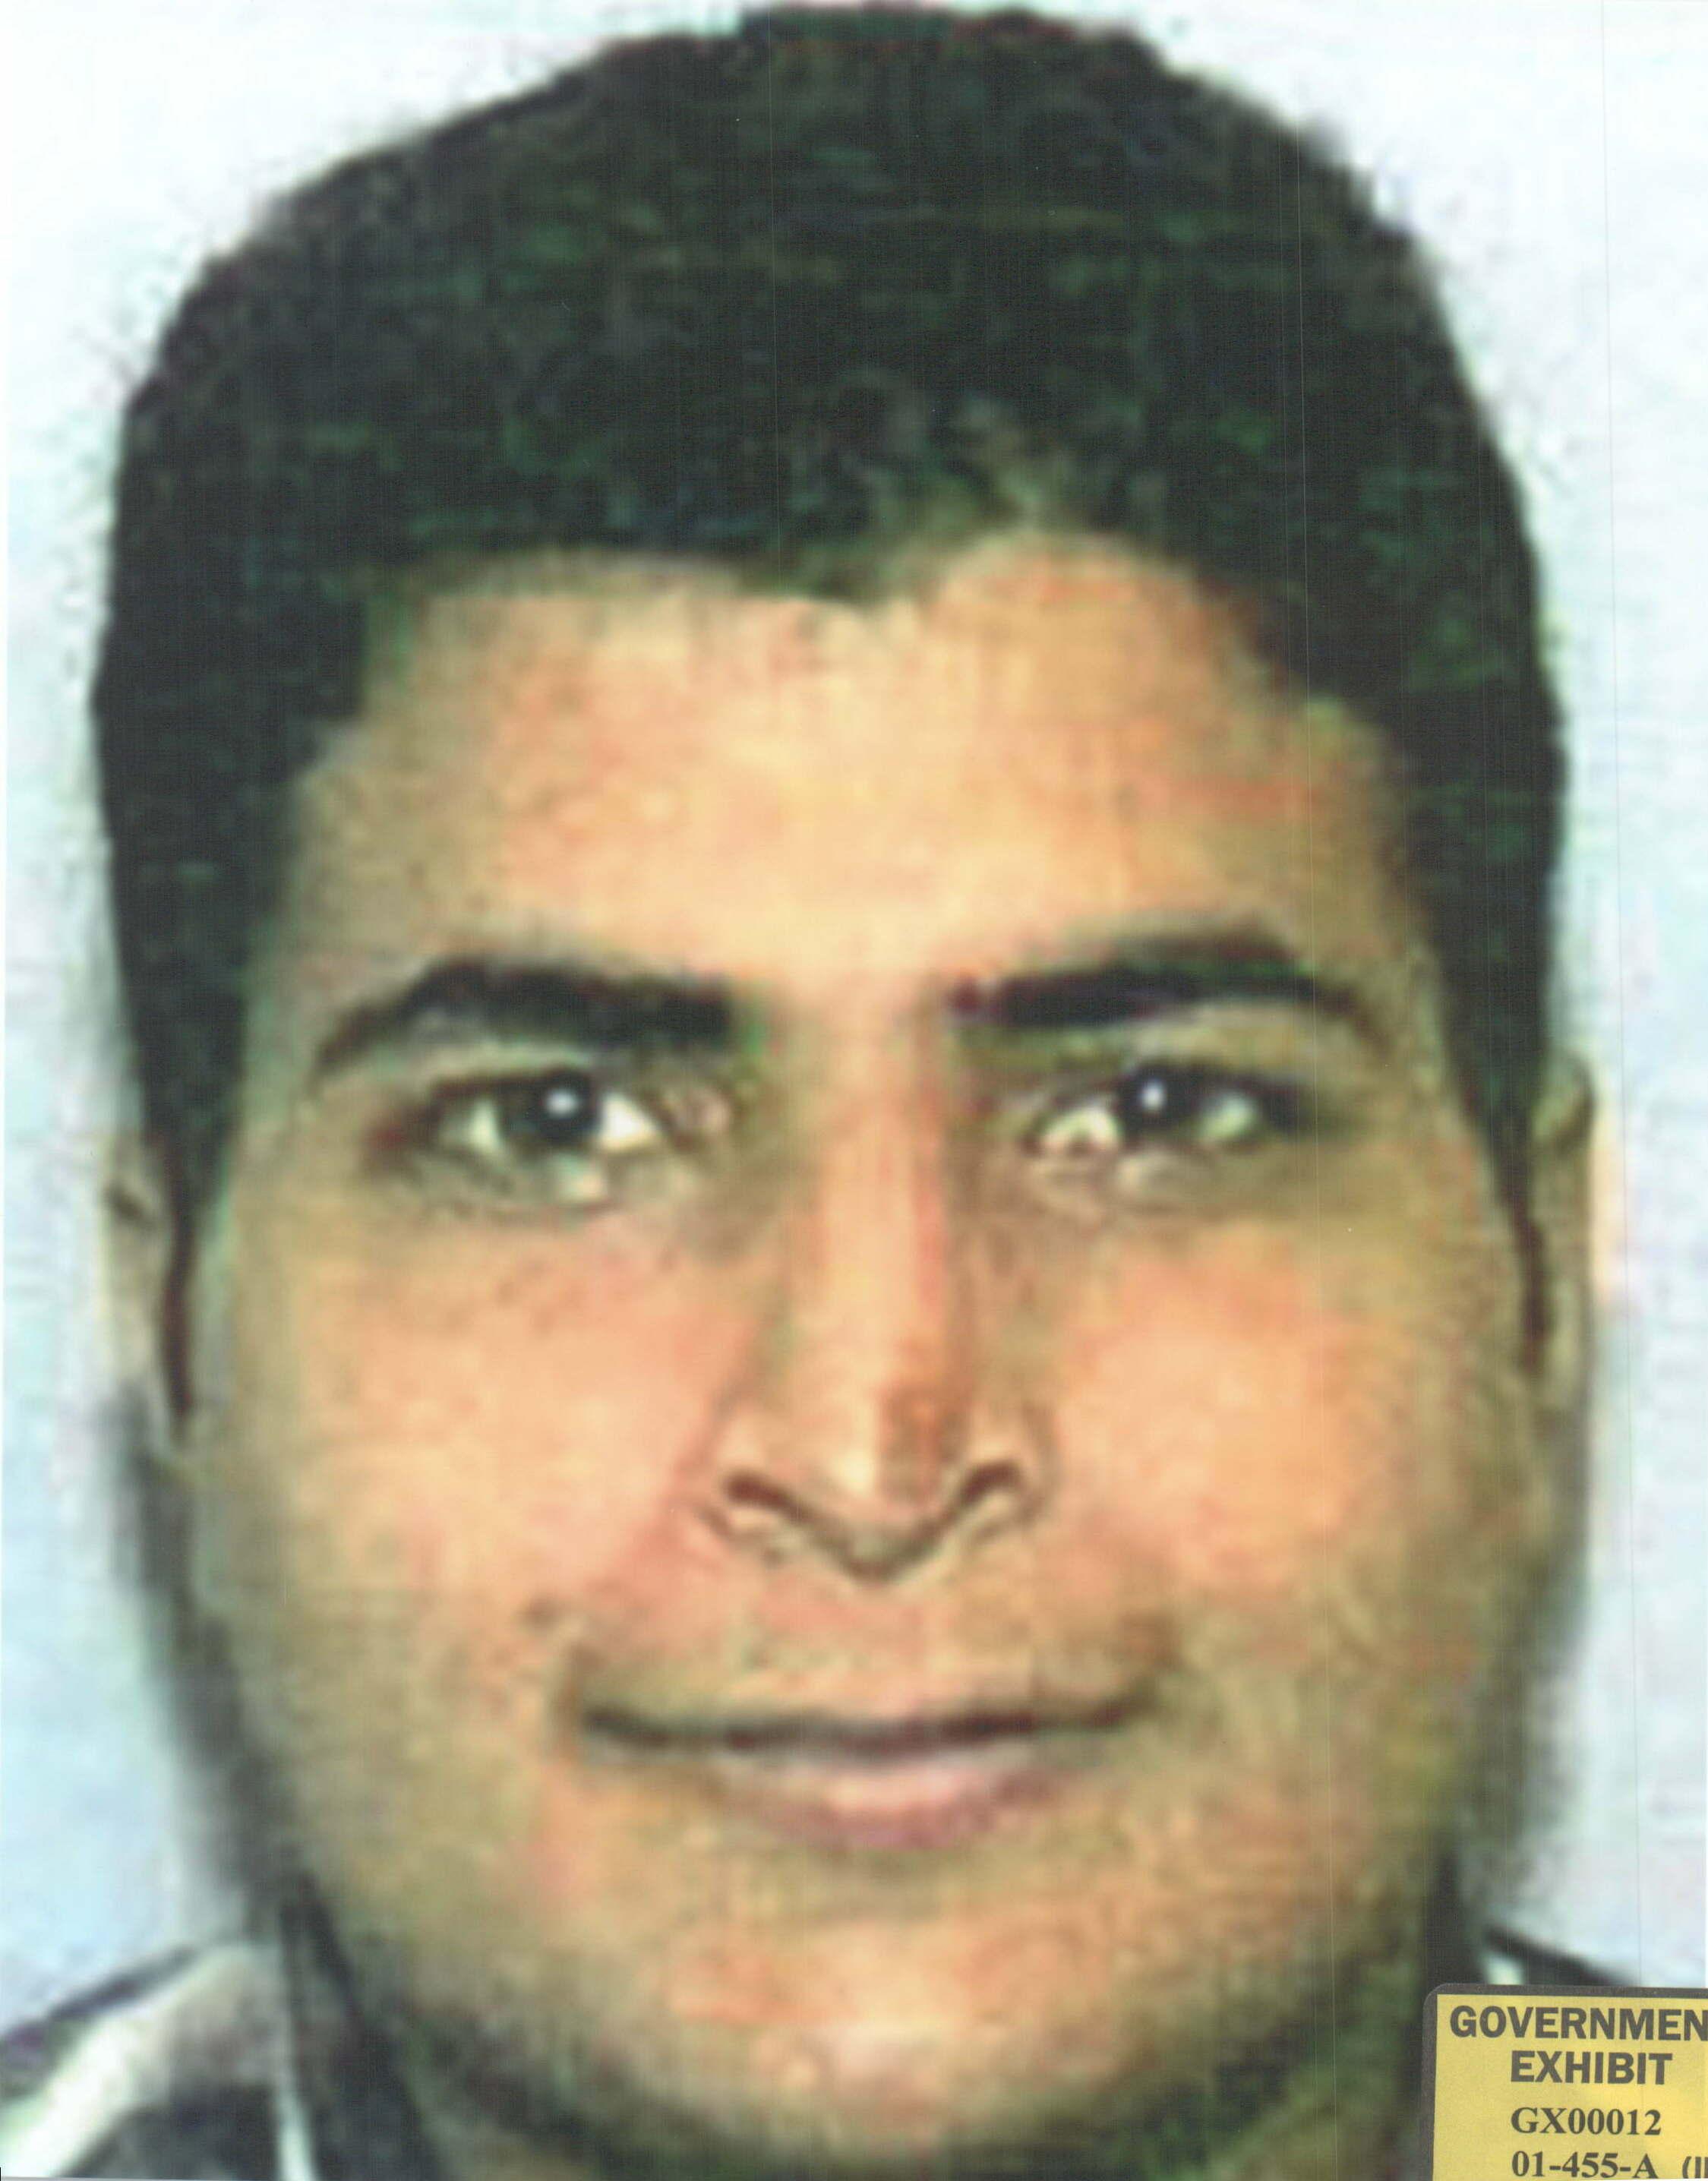 Hamza al-Ghamdi 9/11 hijacker